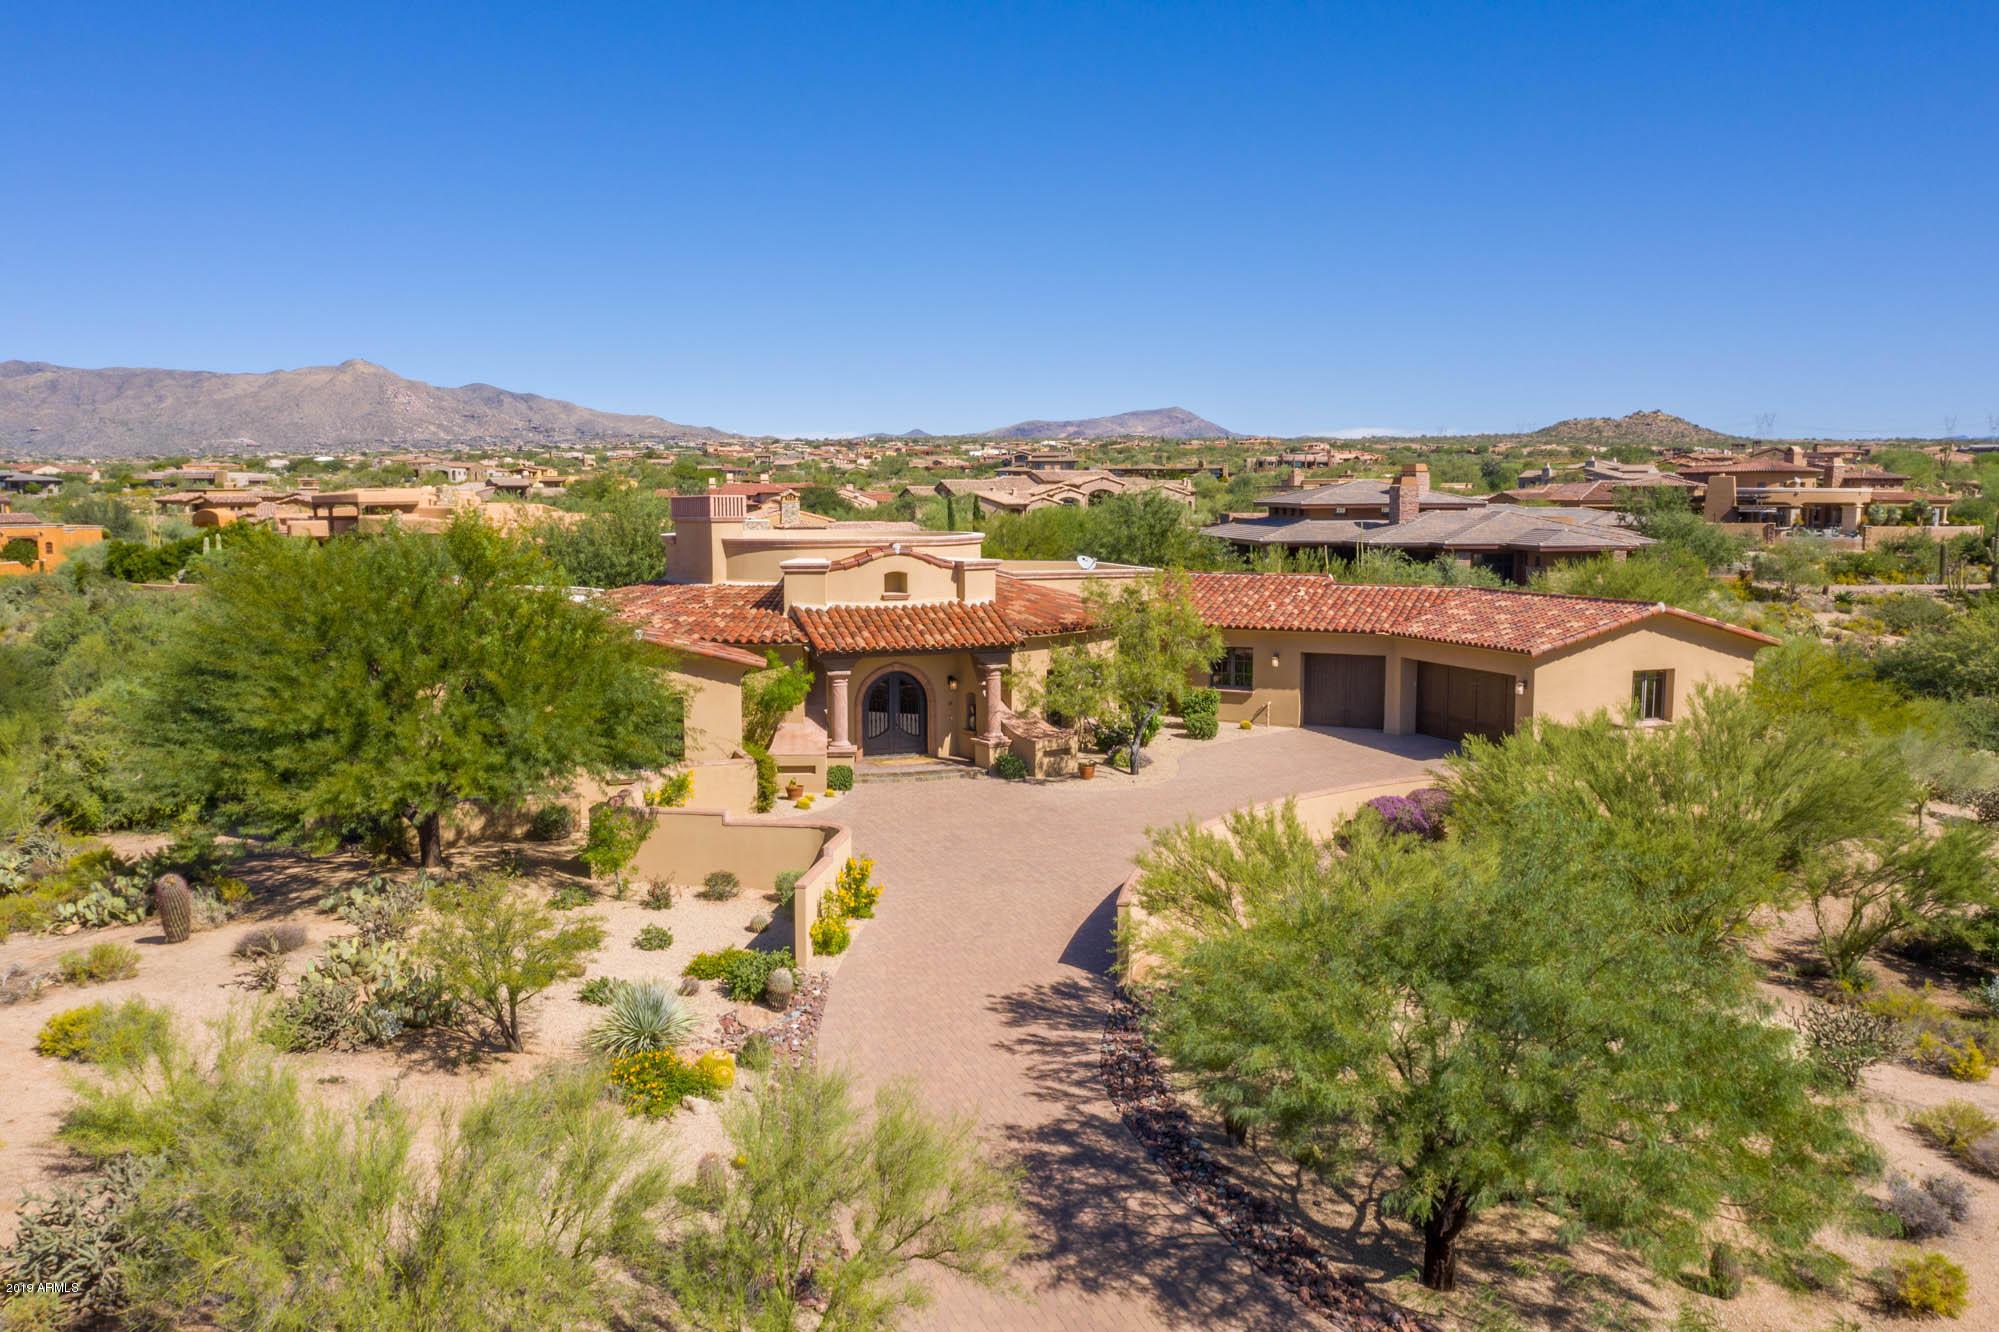 Photo of 10732 E WILDCAT HILL Road, Scottsdale, AZ 85262